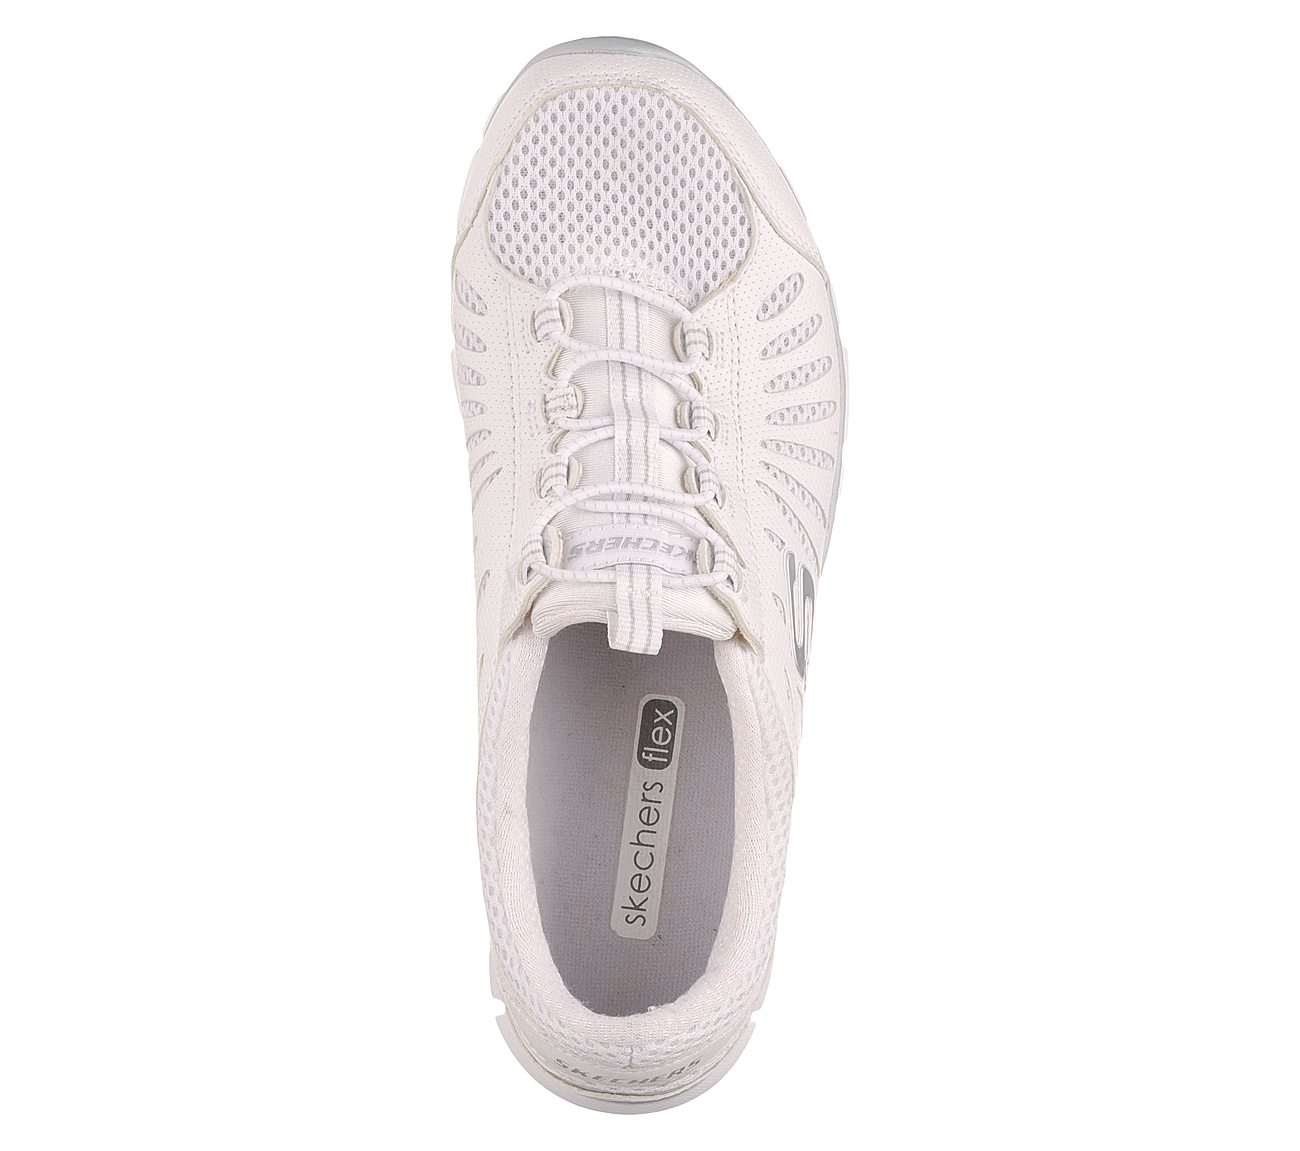 SKECHERS FLEX GRATIS Big Idea White Slip On Shoes Womens US